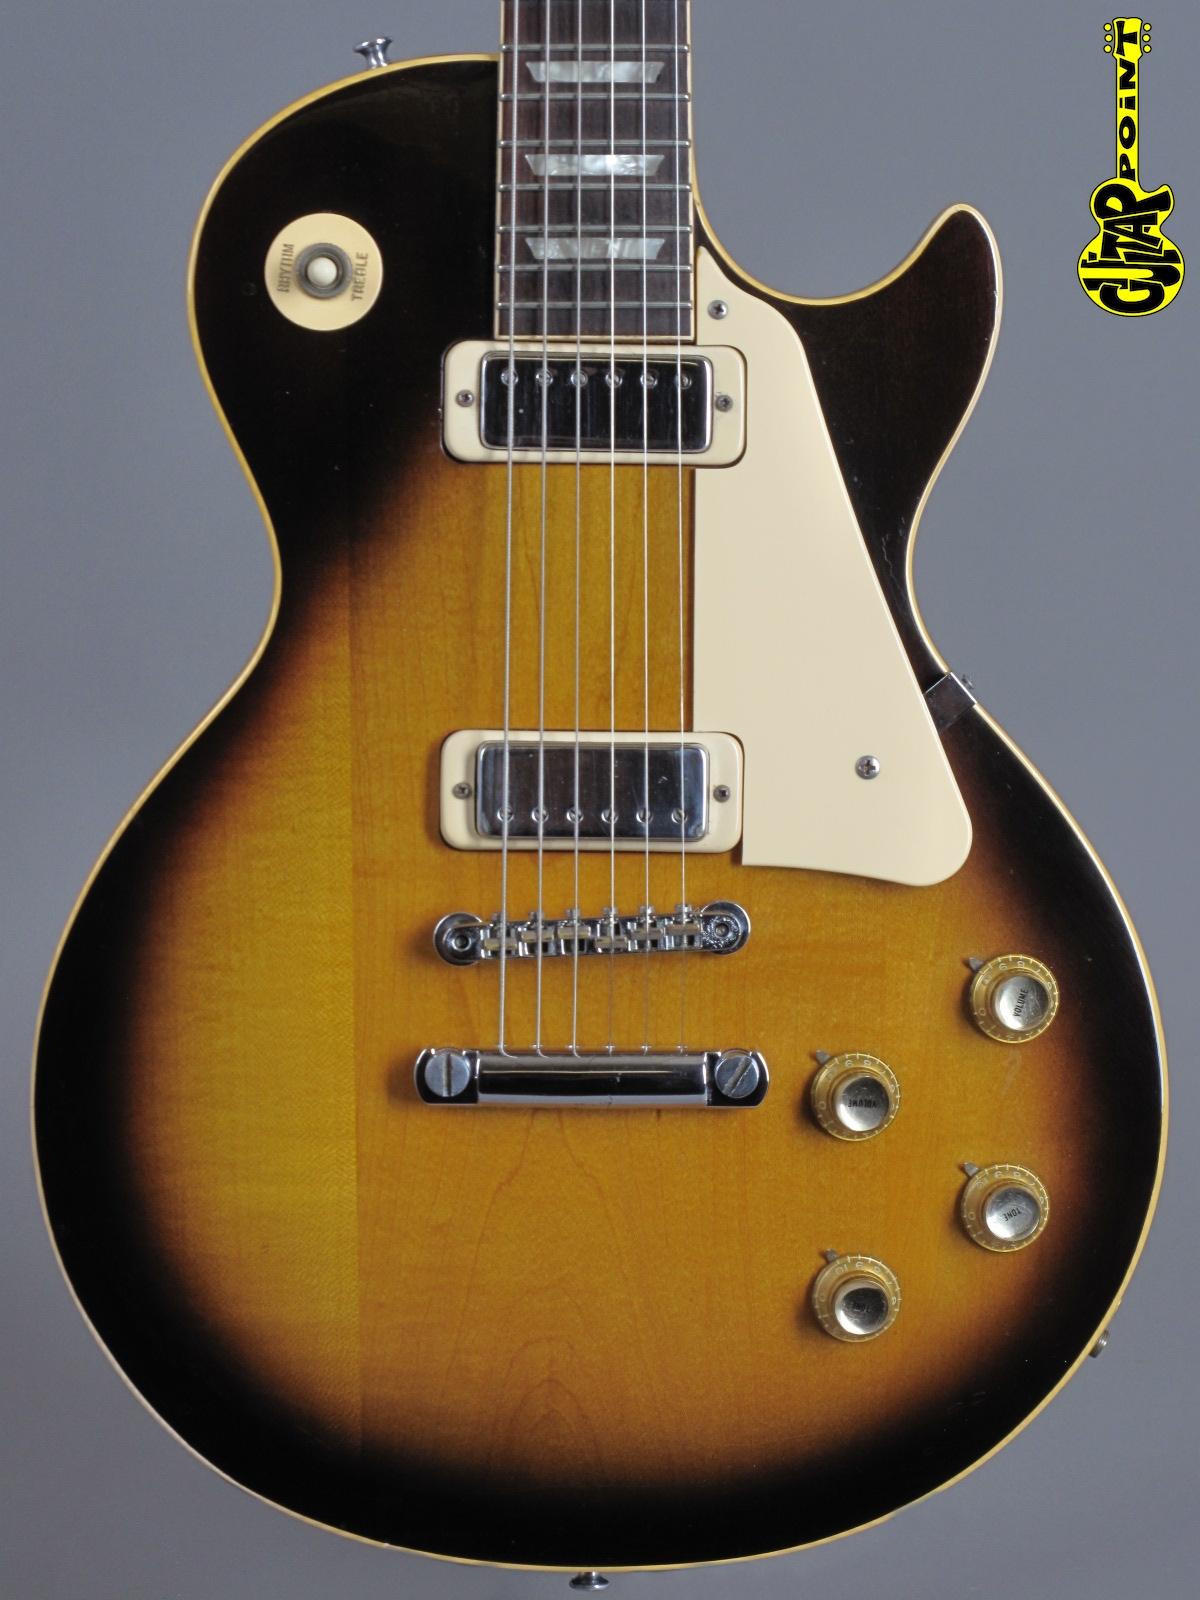 1974 Gibson Les Paul Deluxe - Tobacco Sunburst